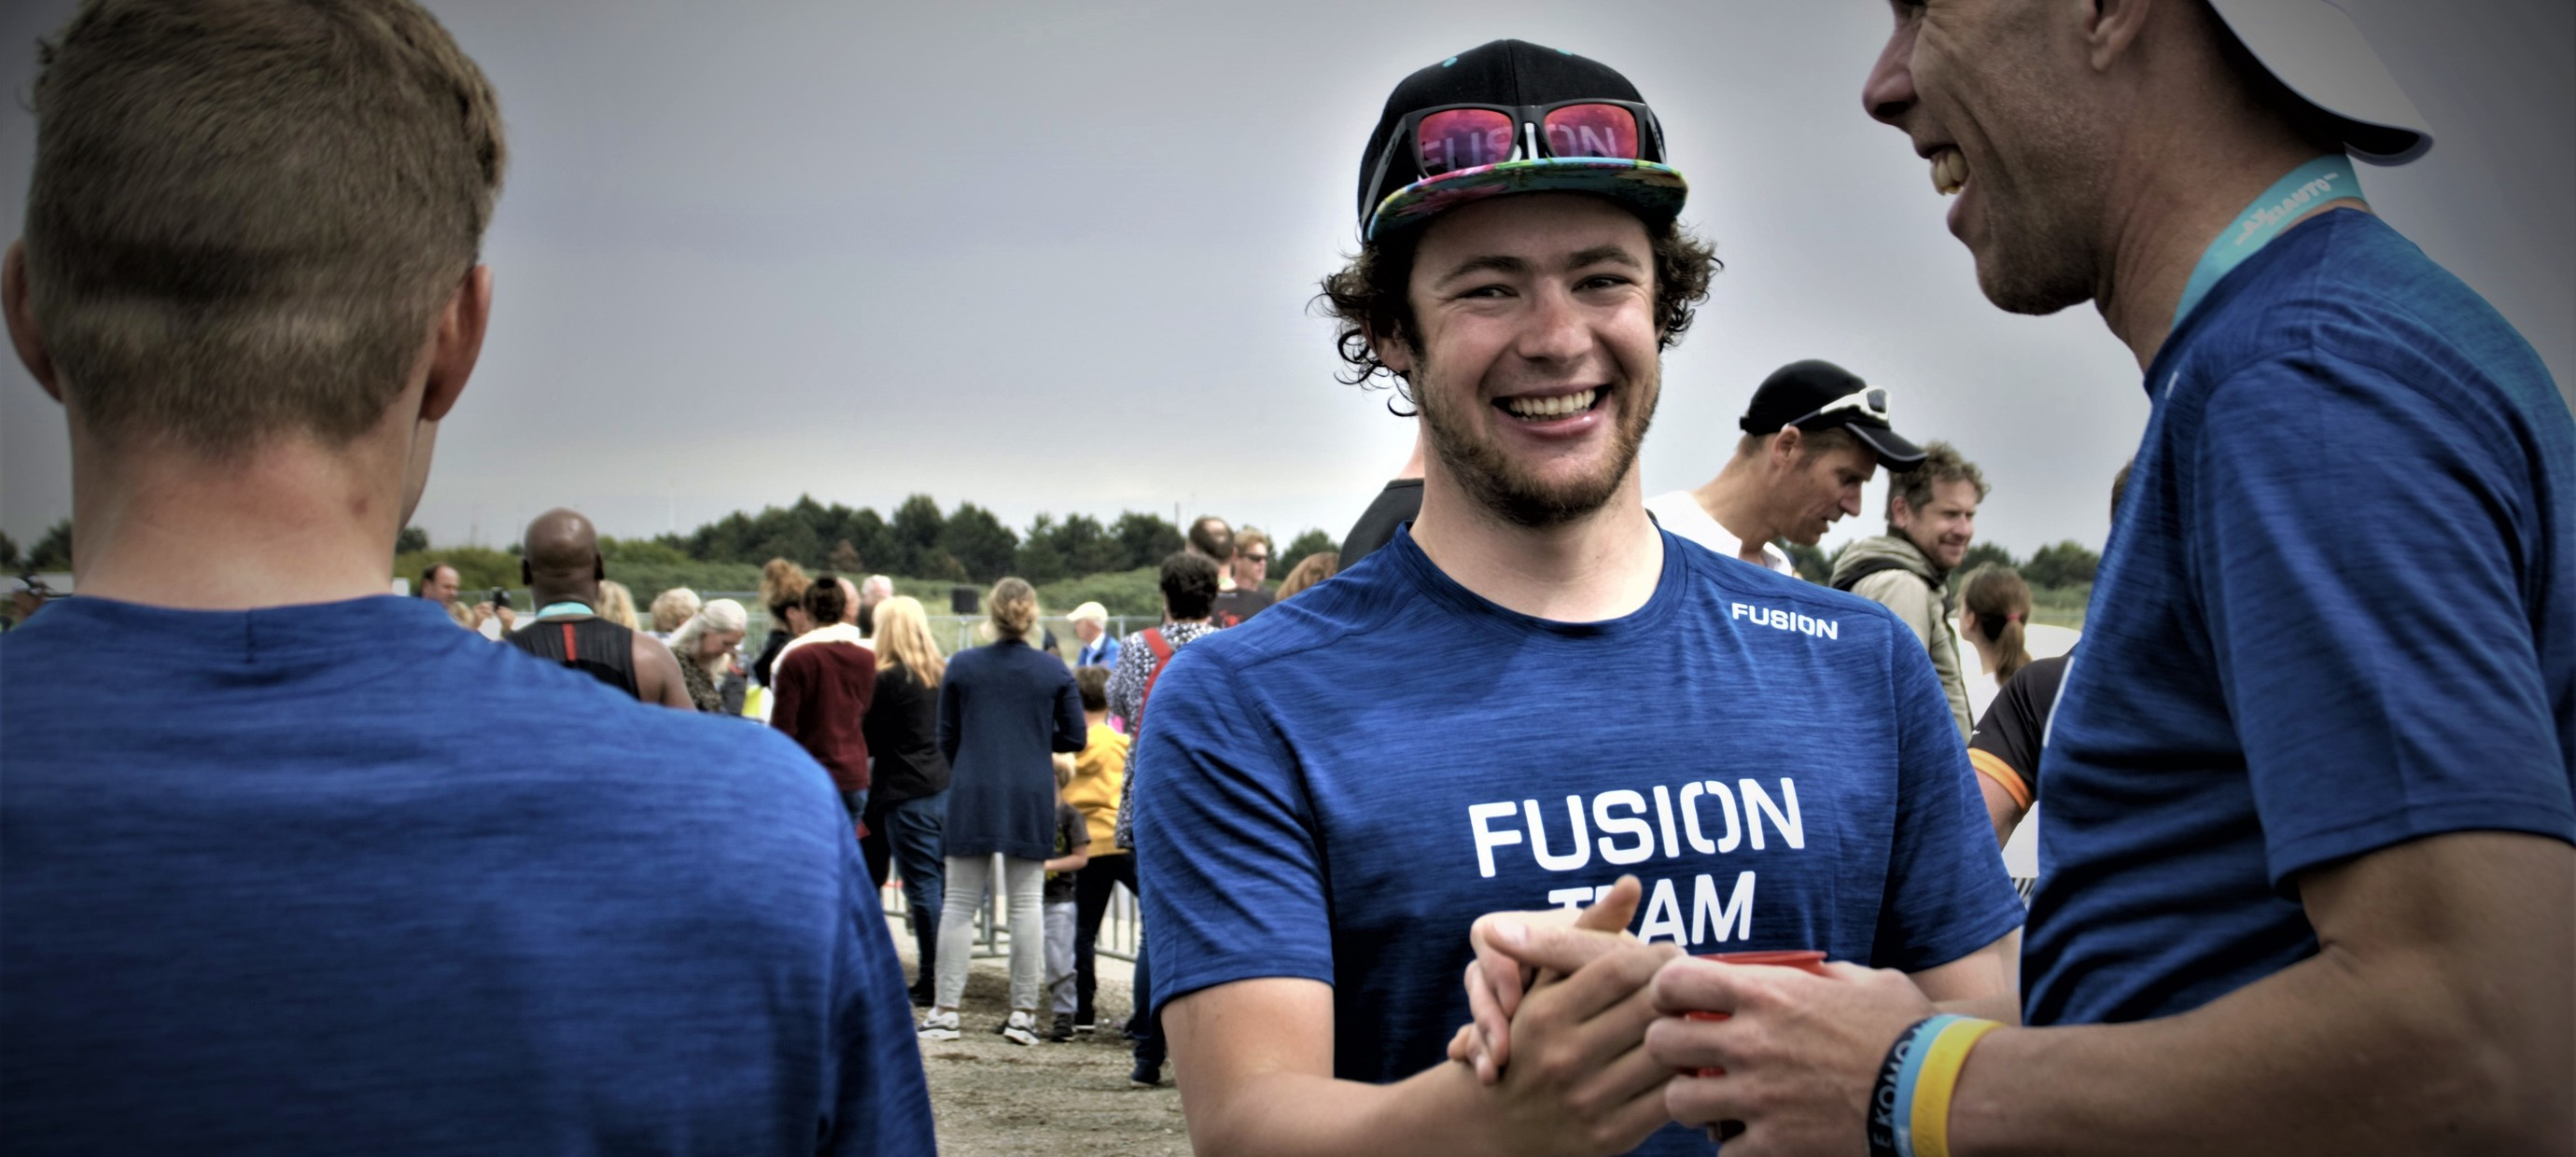 Thuiswinst FUSIONTEAM atleet Marco Akershoek | Triathlon Brouwersdam '90